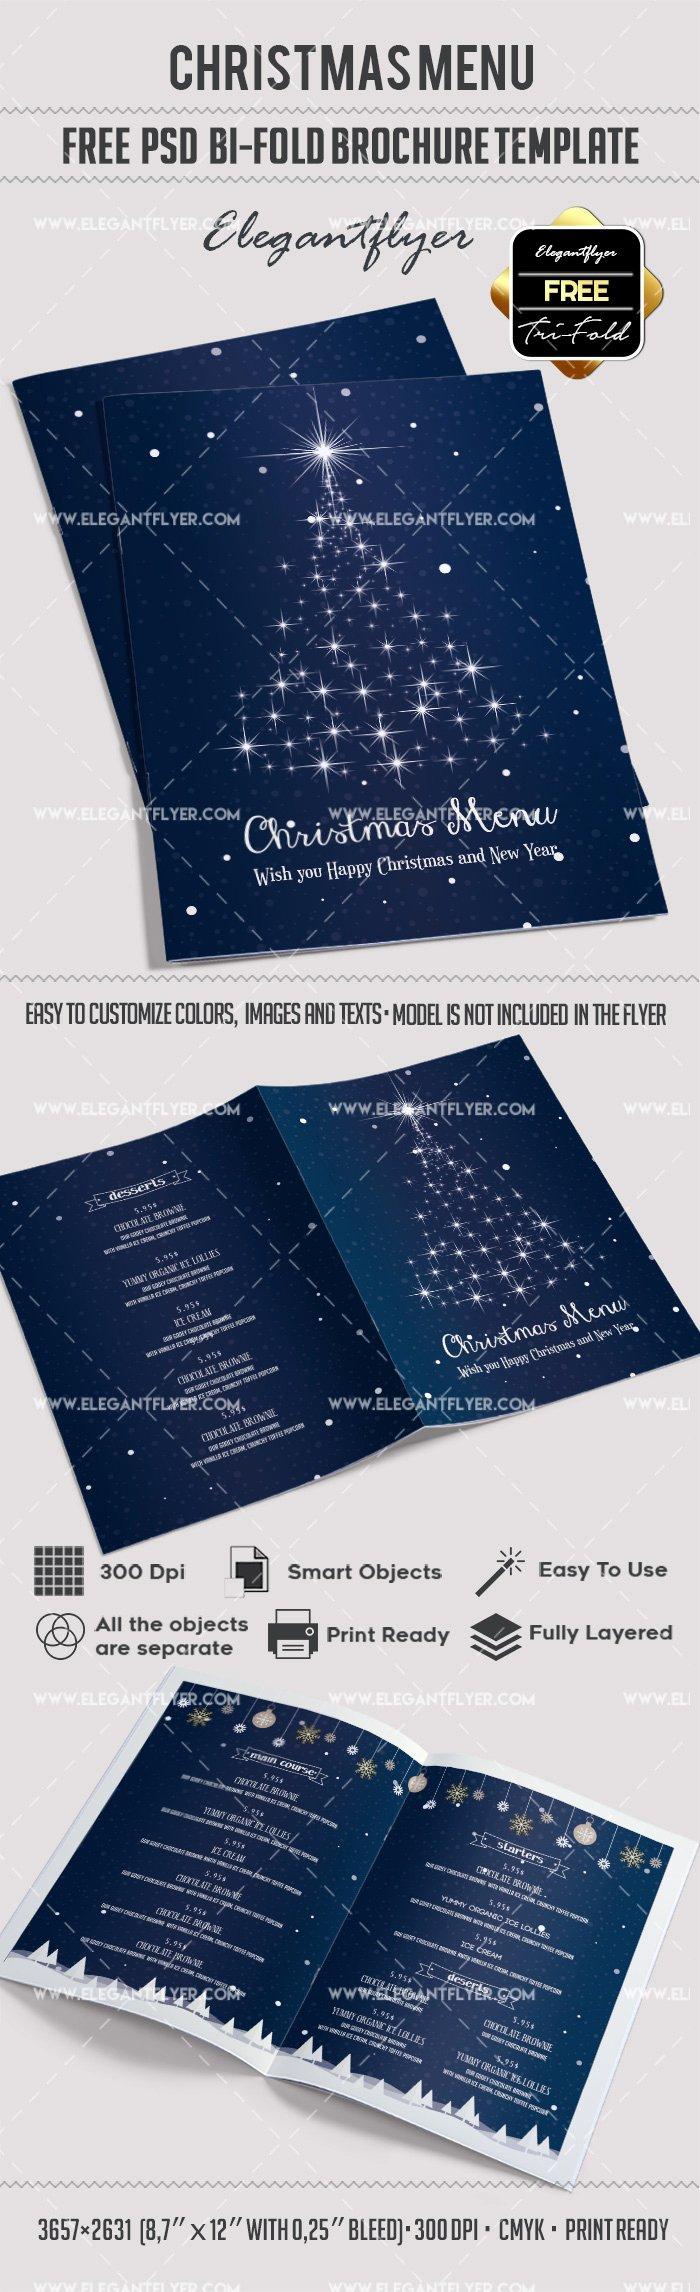 Bi Fold Menu Template Elegant Free Christmas Menu – Bi Fold Psd Brochure Template – by